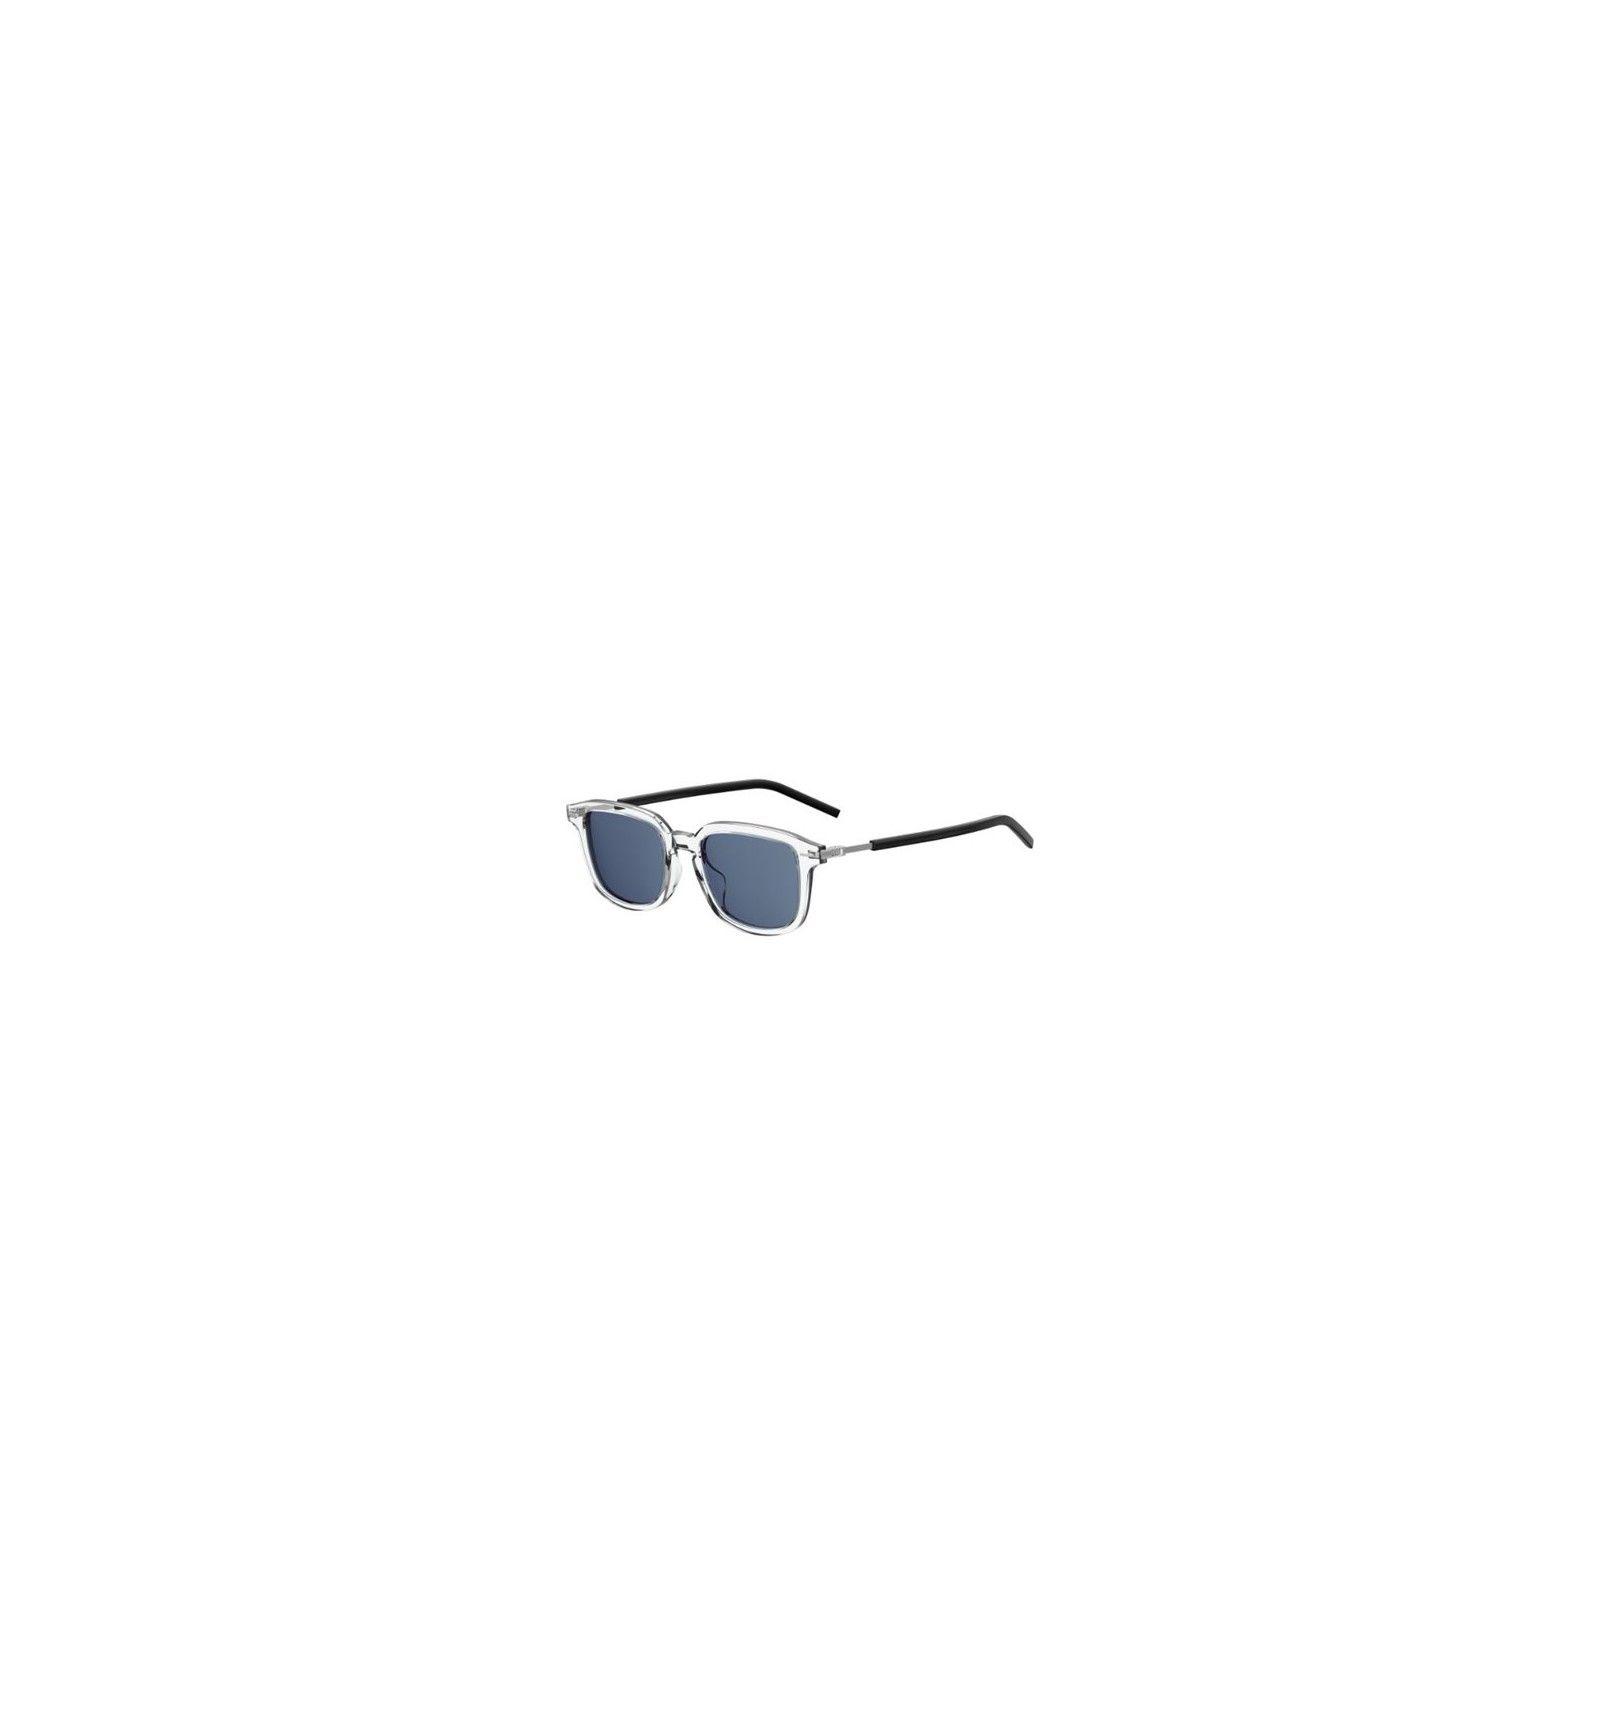 Crystal Homme Gafas Technicity Blue Dior Avioy 1f De Sol Ar900 oedxBrCW